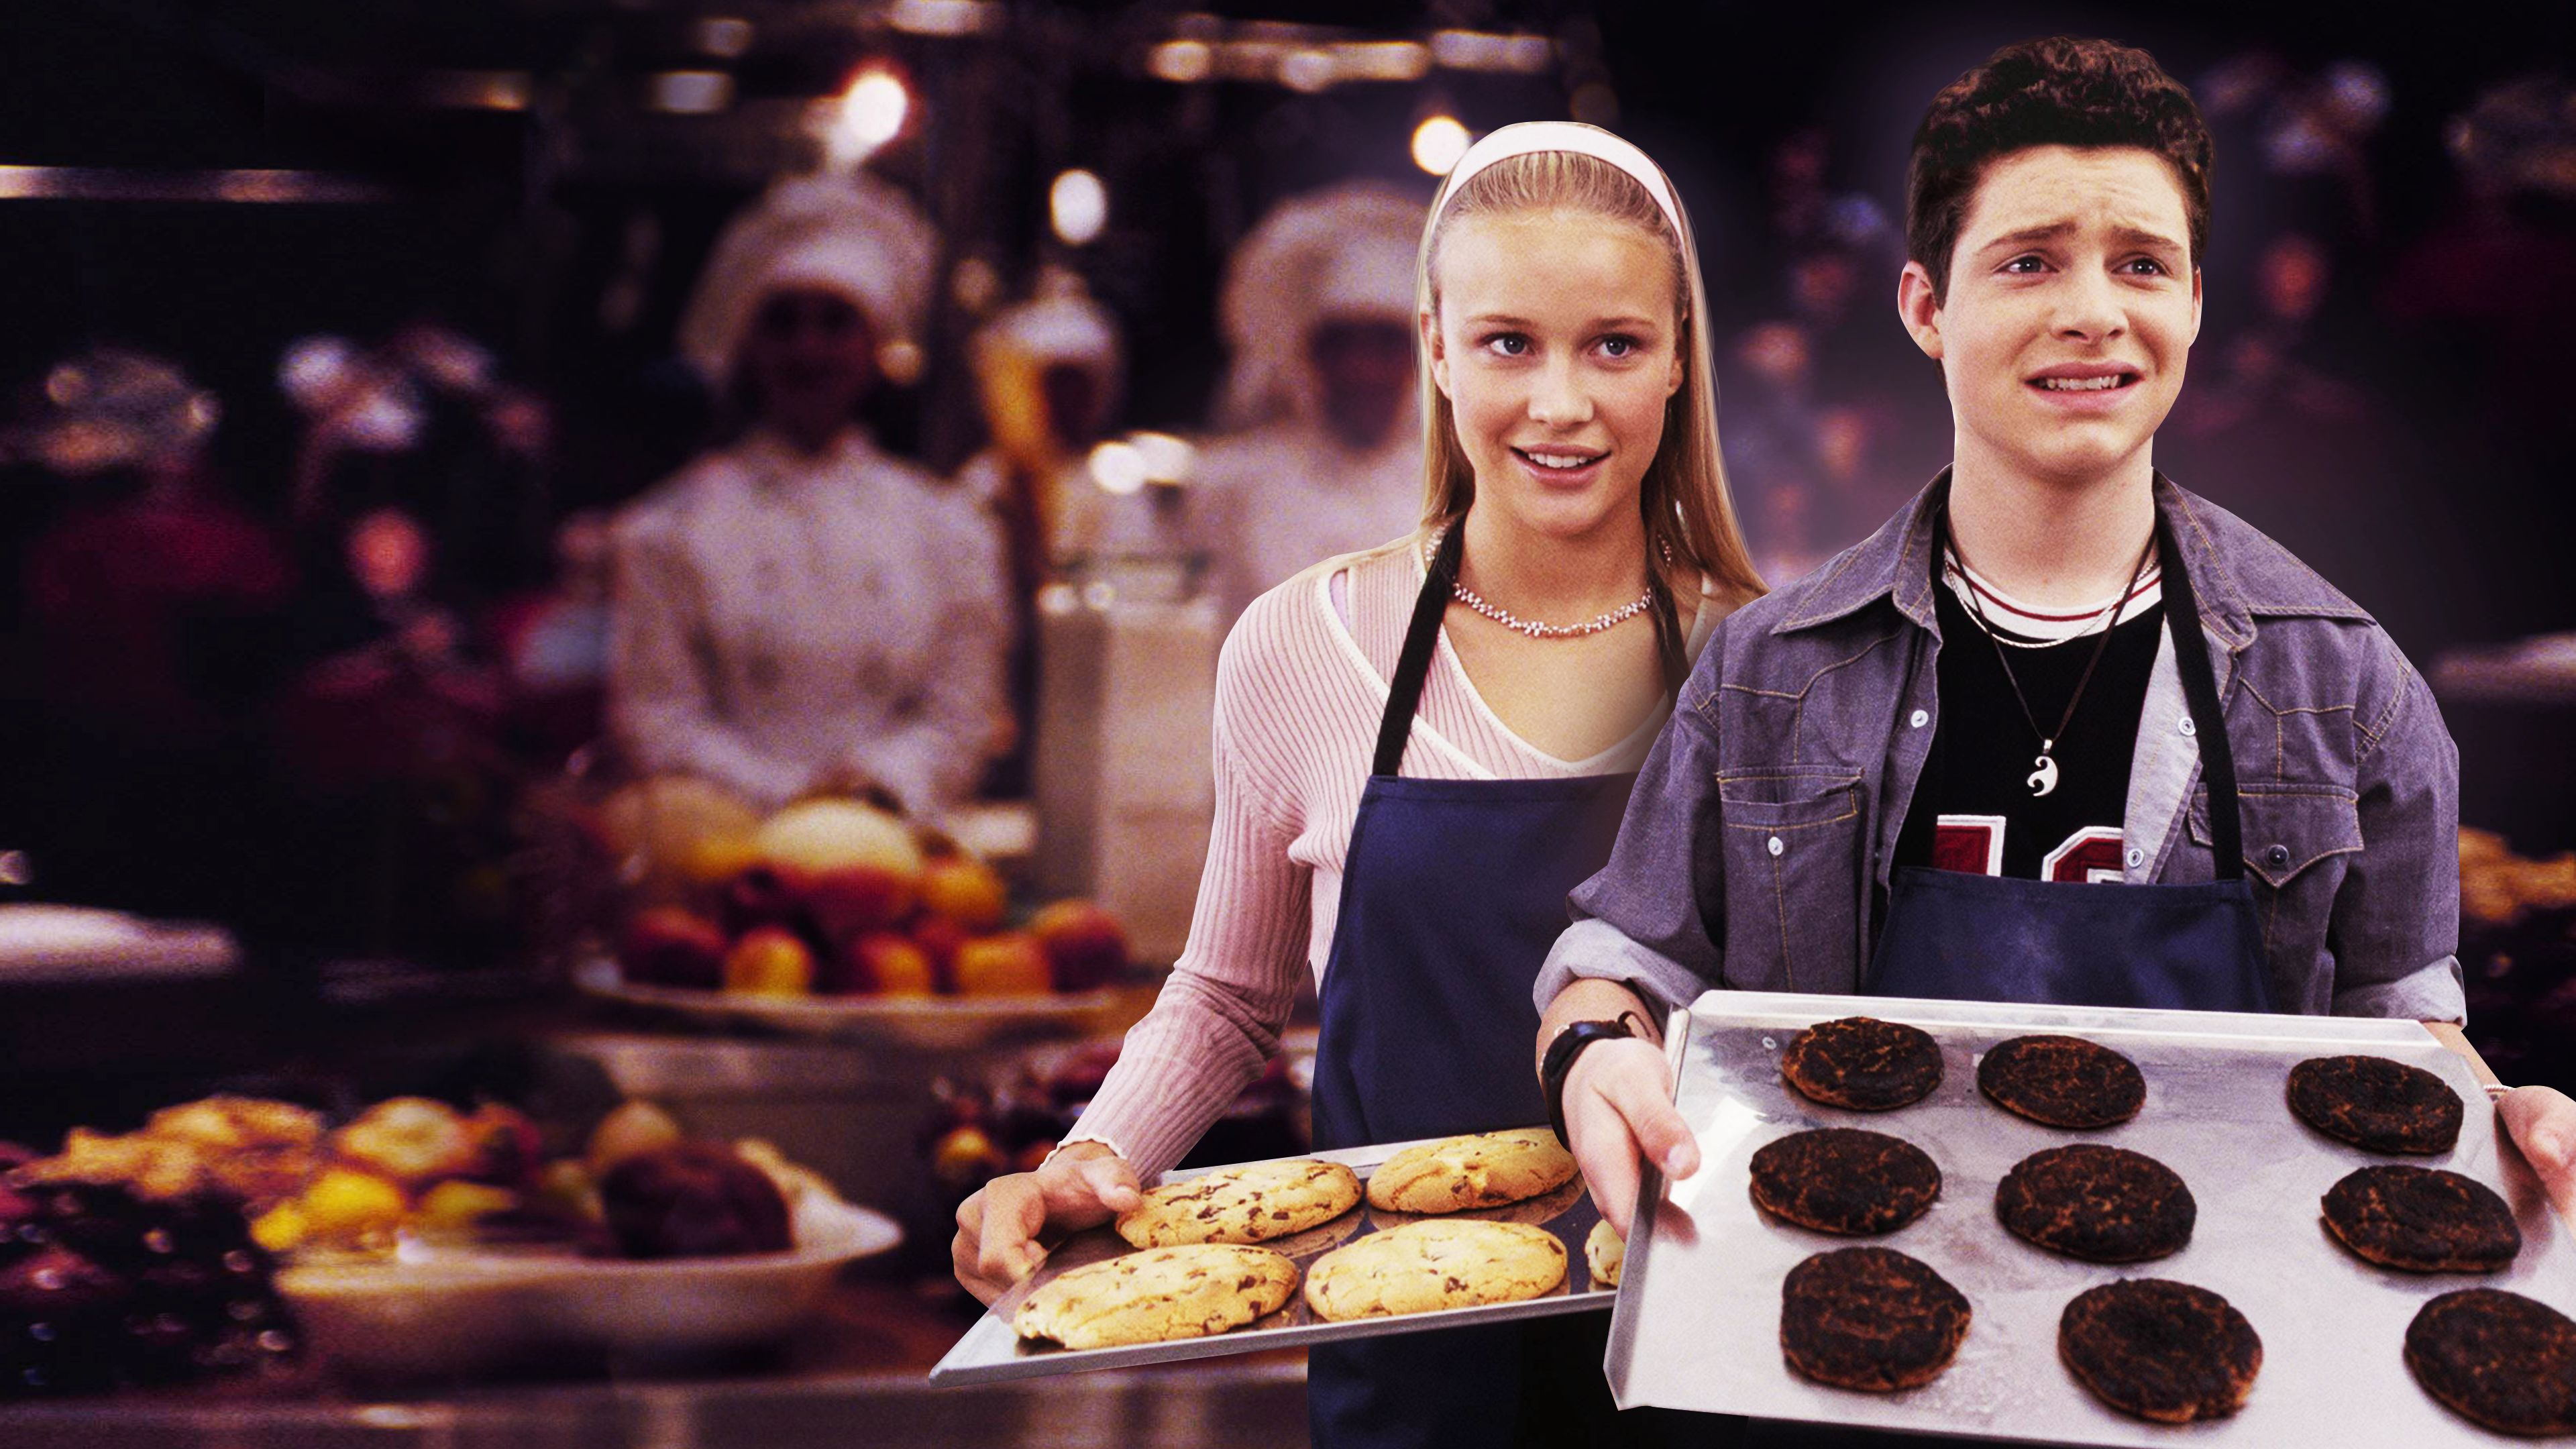 Kijk de volledige film Eddie's Million Dollar Cook-off ...